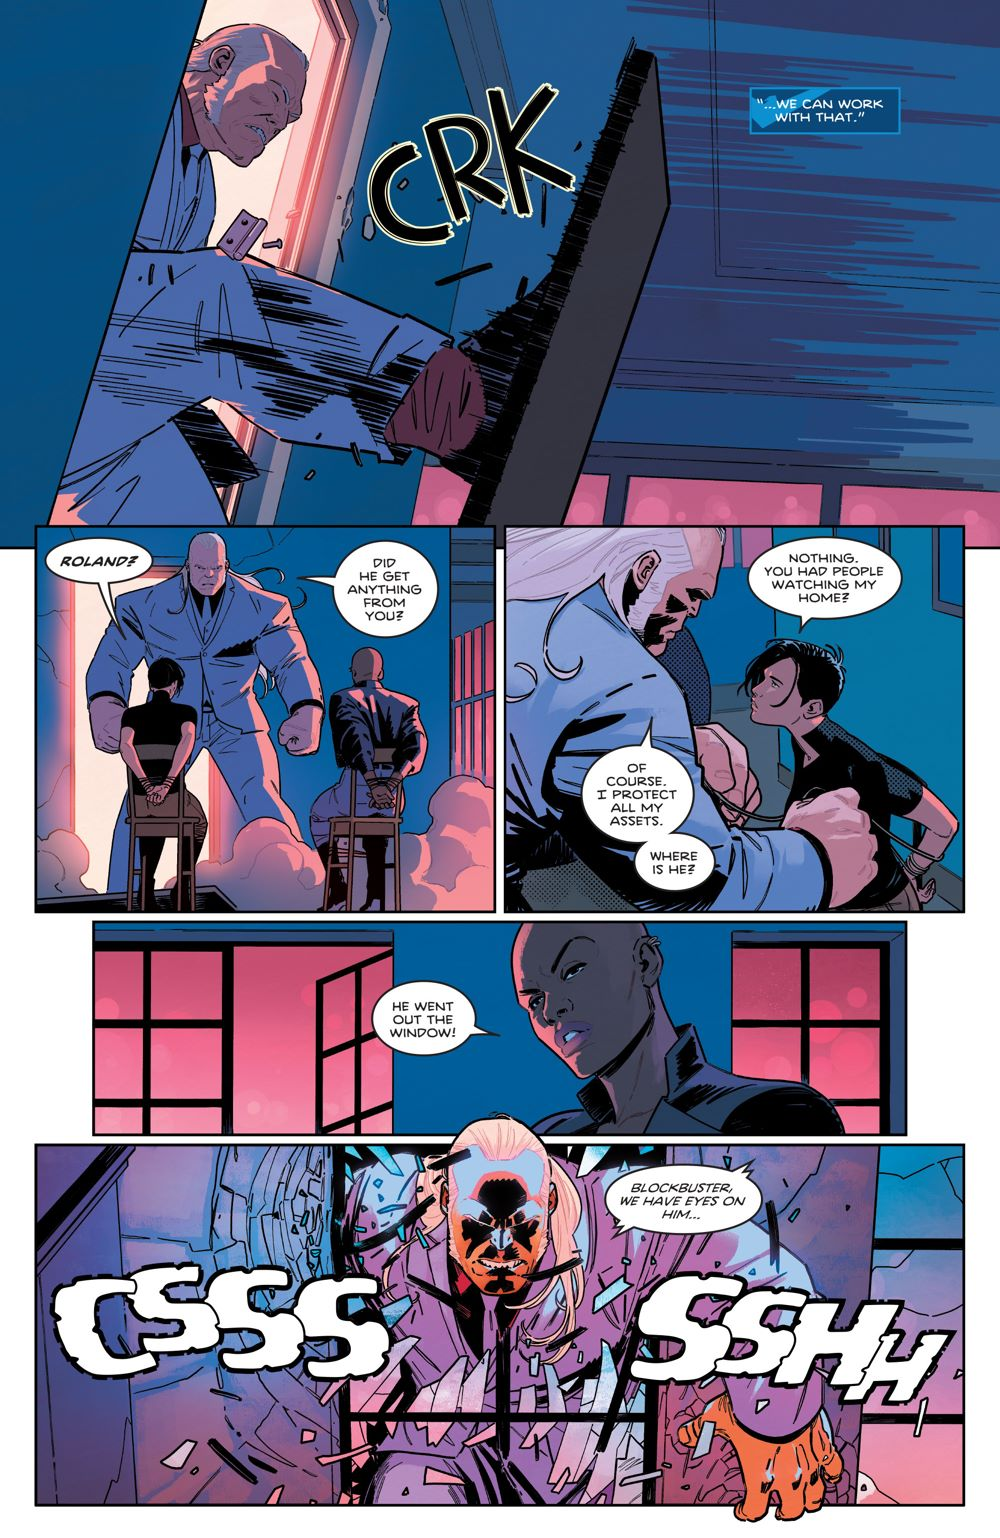 Nightwing-83-6_6115c90c469c96.48950971 ComicList Previews: NIGHTWING #83